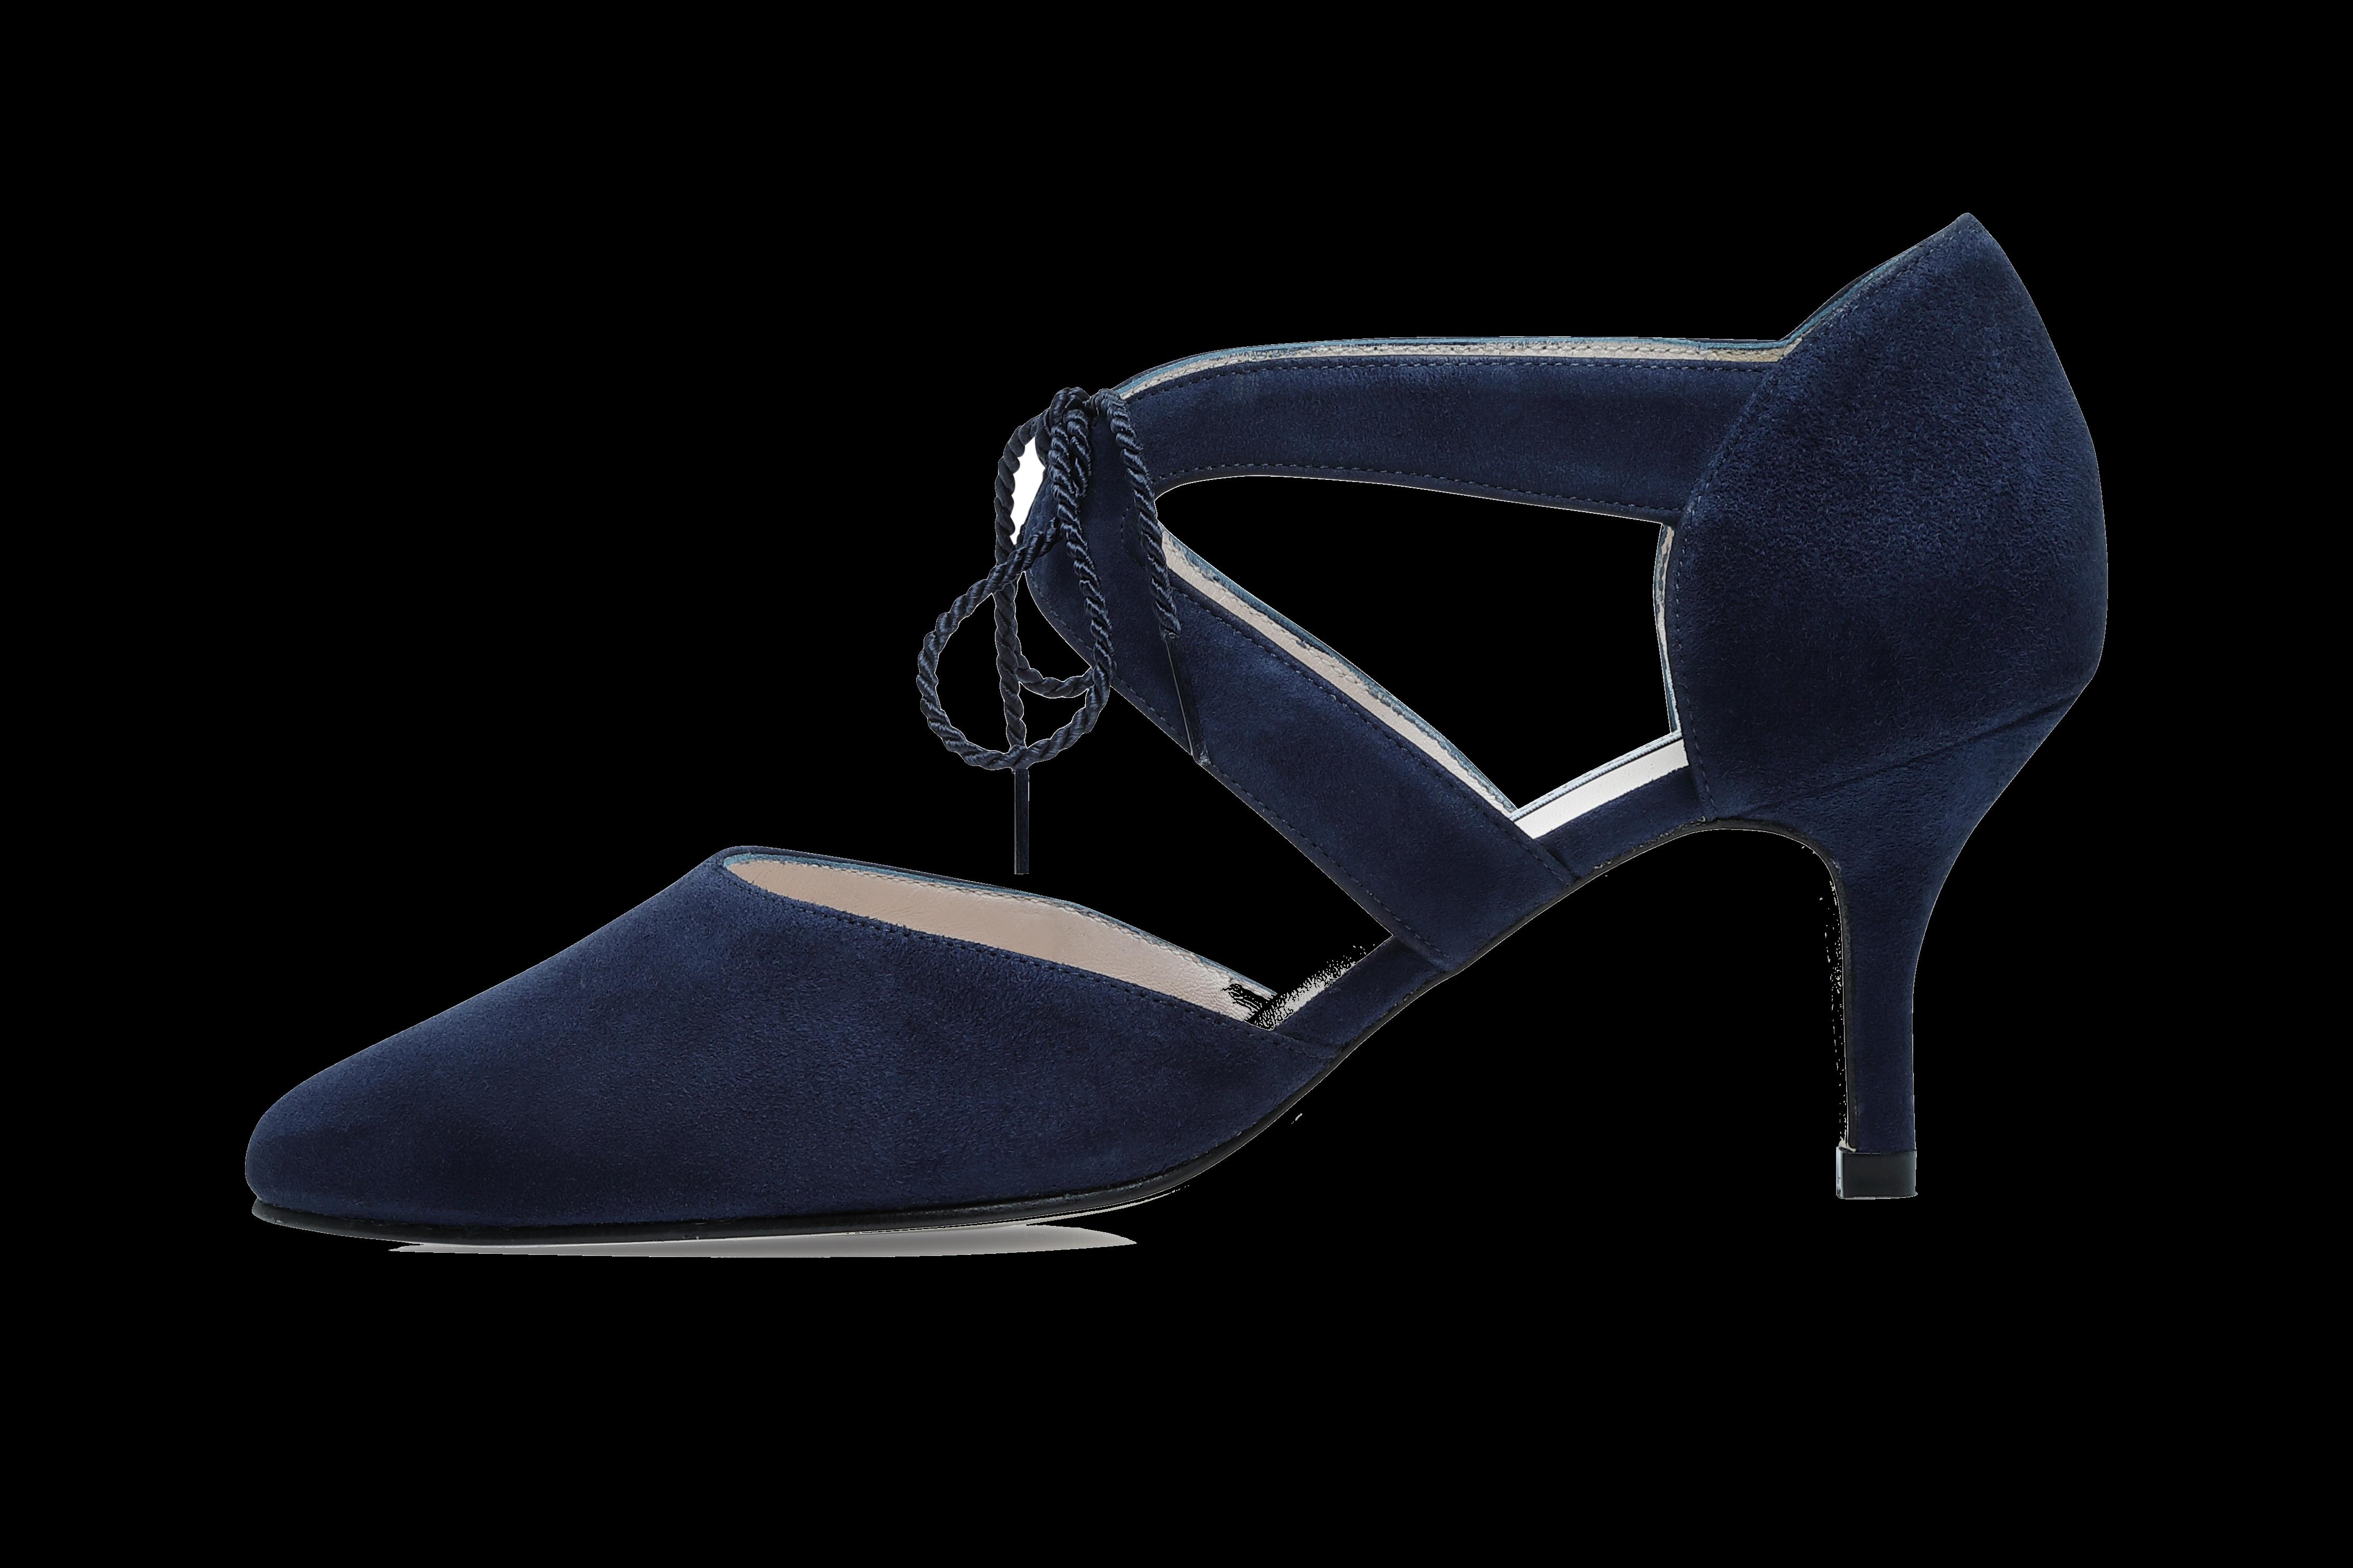 Ava Wide Fit Kitten Heel Shoes - Navy